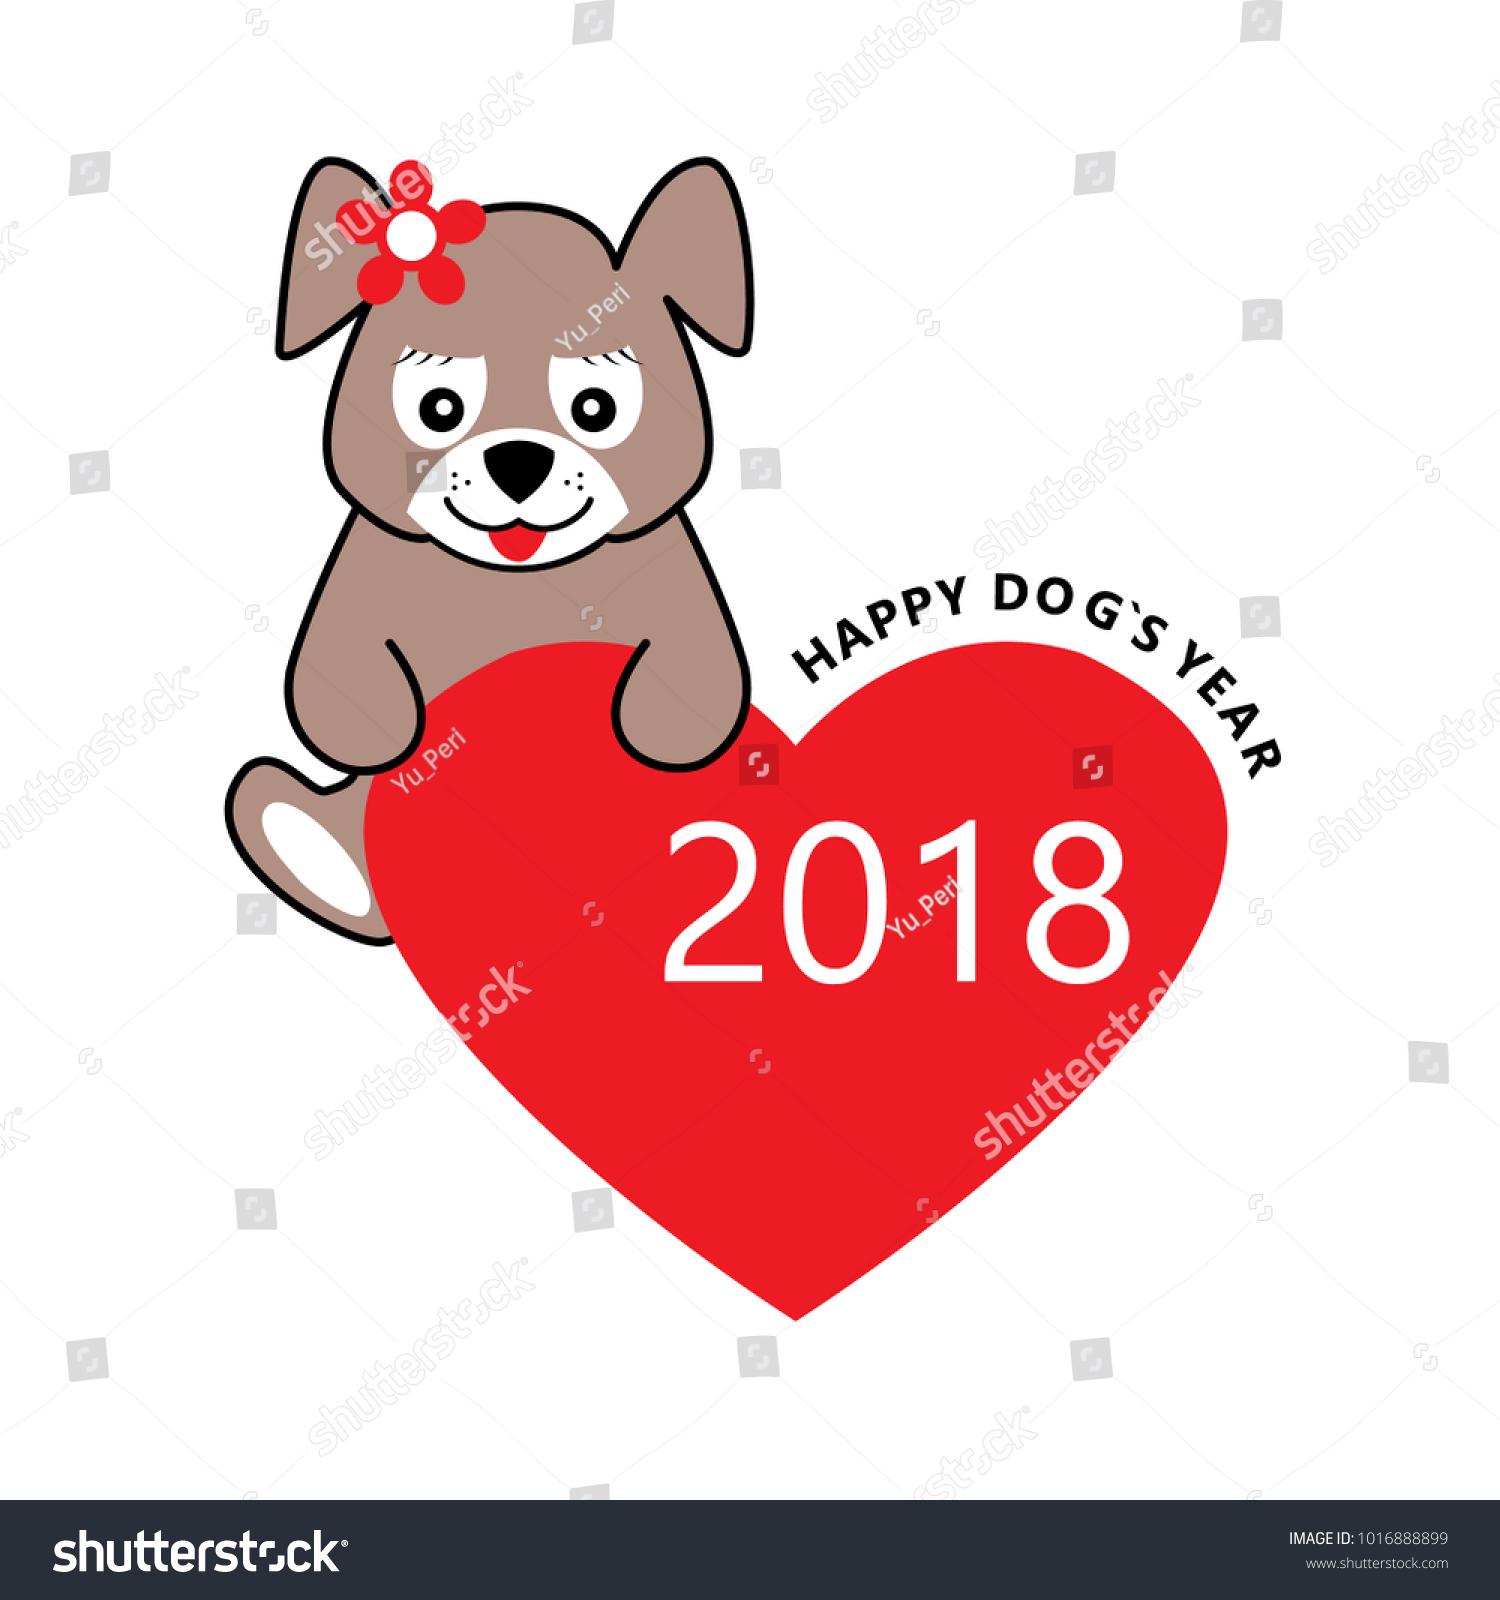 Puppy big heart vector valentines day stock vector 1016888899 puppy with big heart vector valentines day card dog symbol chinese new year 2018 buycottarizona